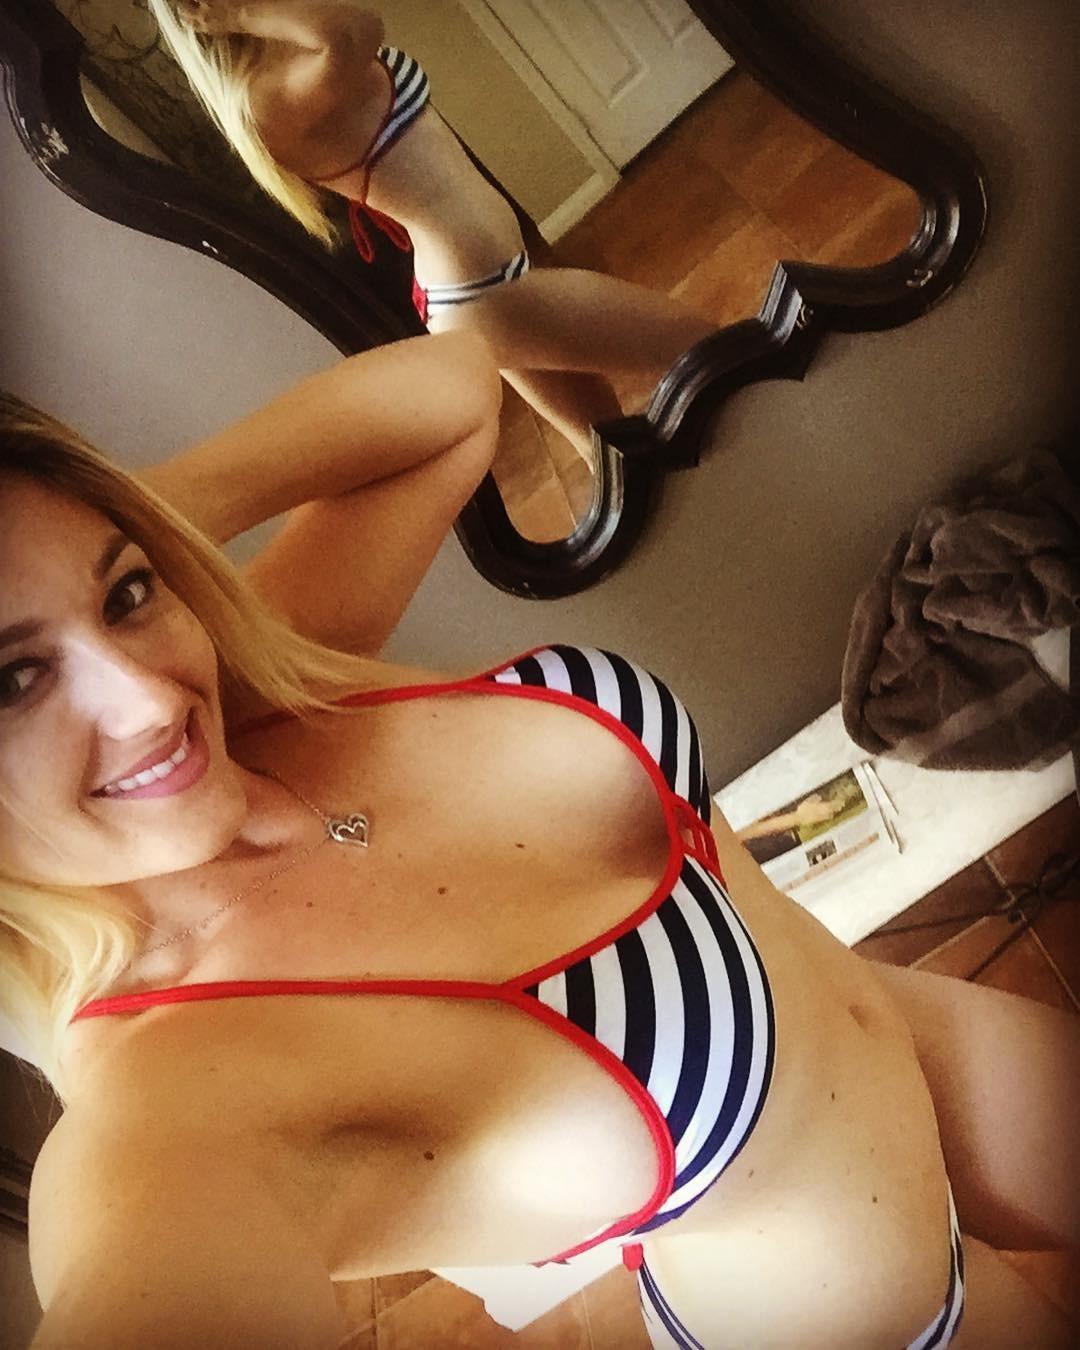 Katie Vernola Leaked Naked and Masturbating